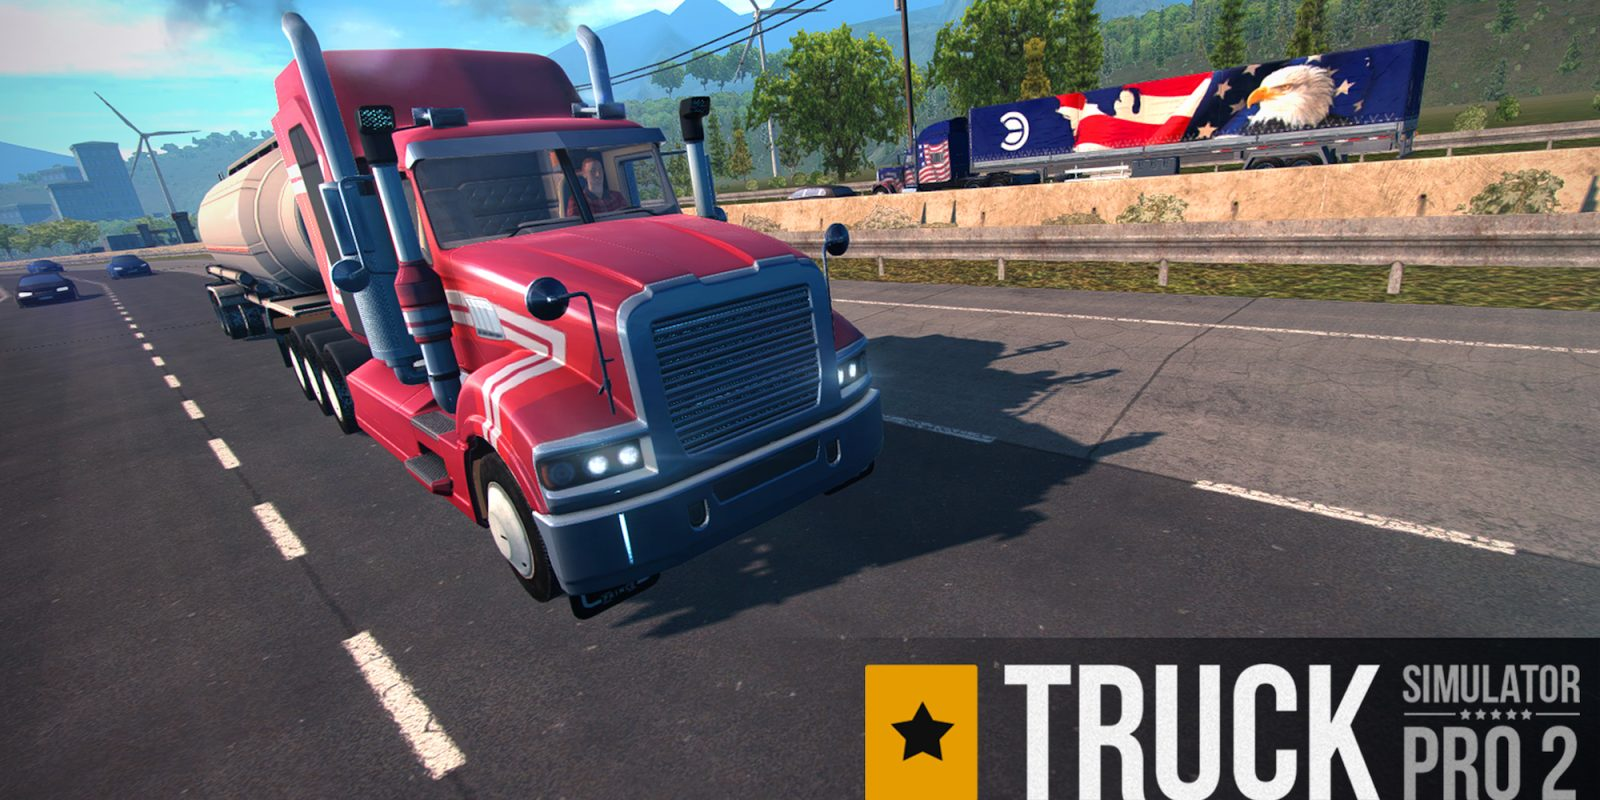 Today's Best iOS & Mac App Deals: Truck Simulator PRO 2, Last Voyage, more